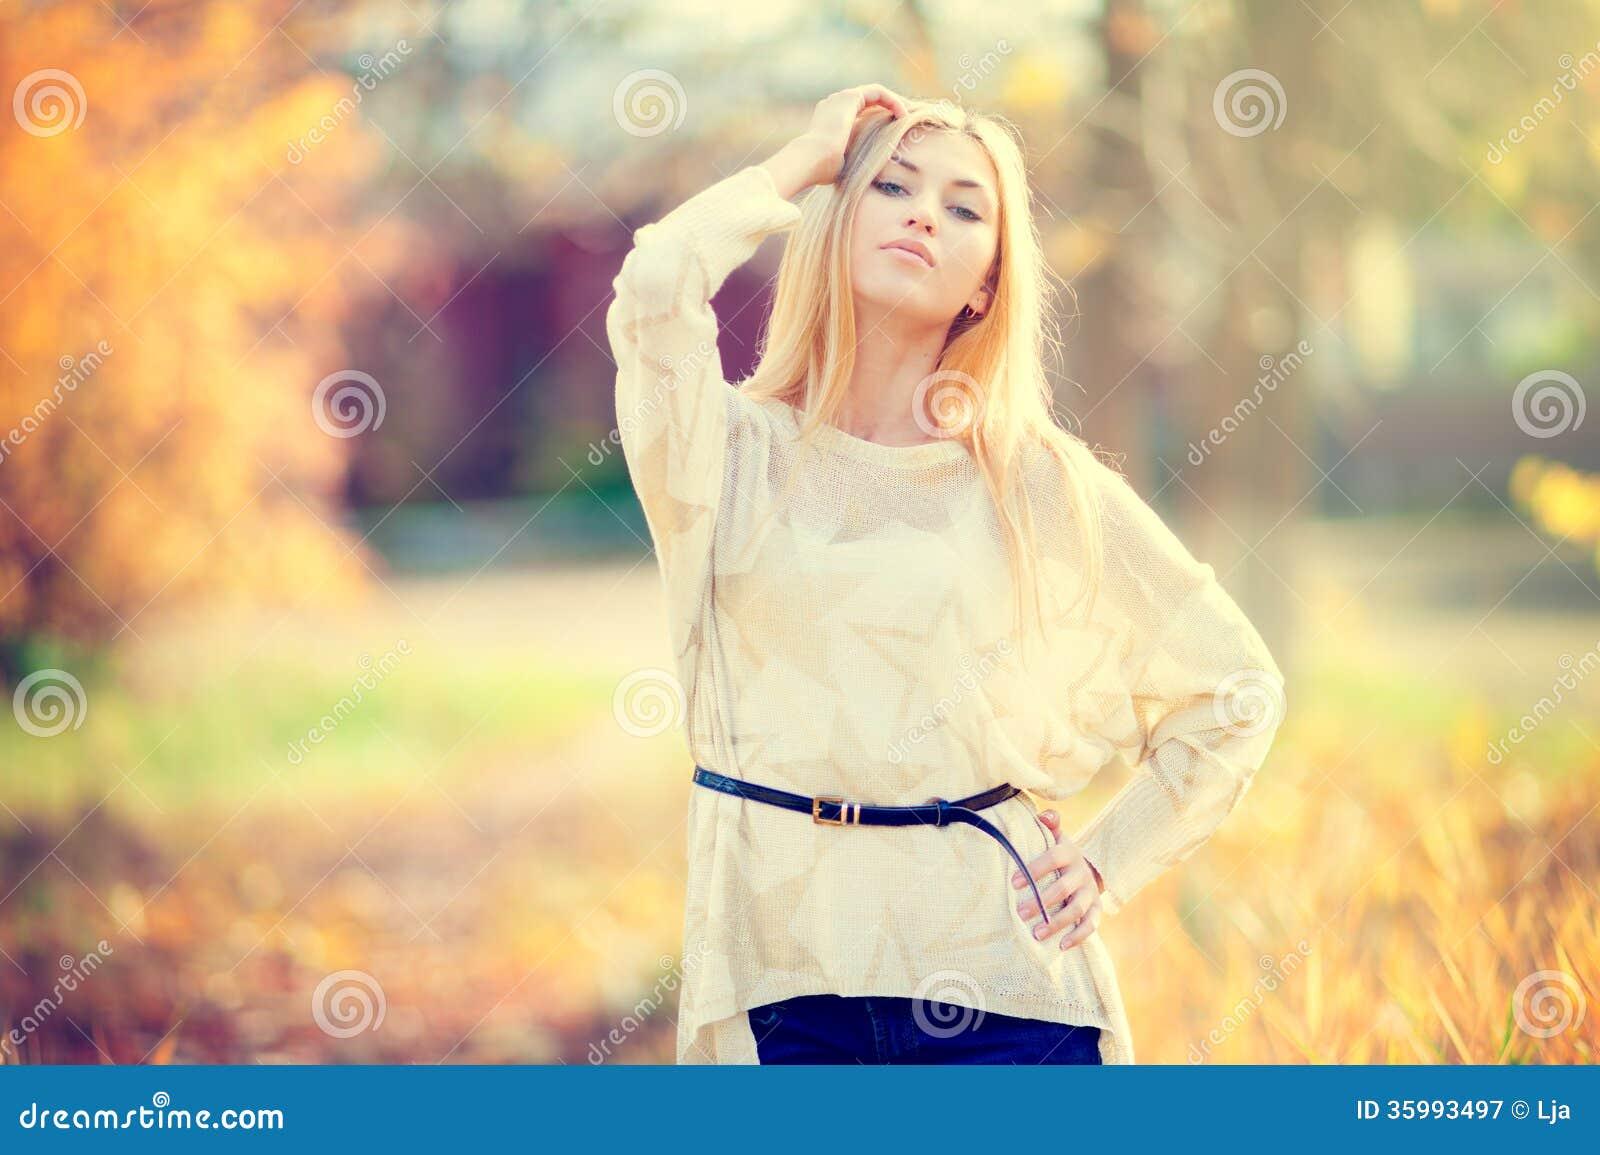 Woman portarit